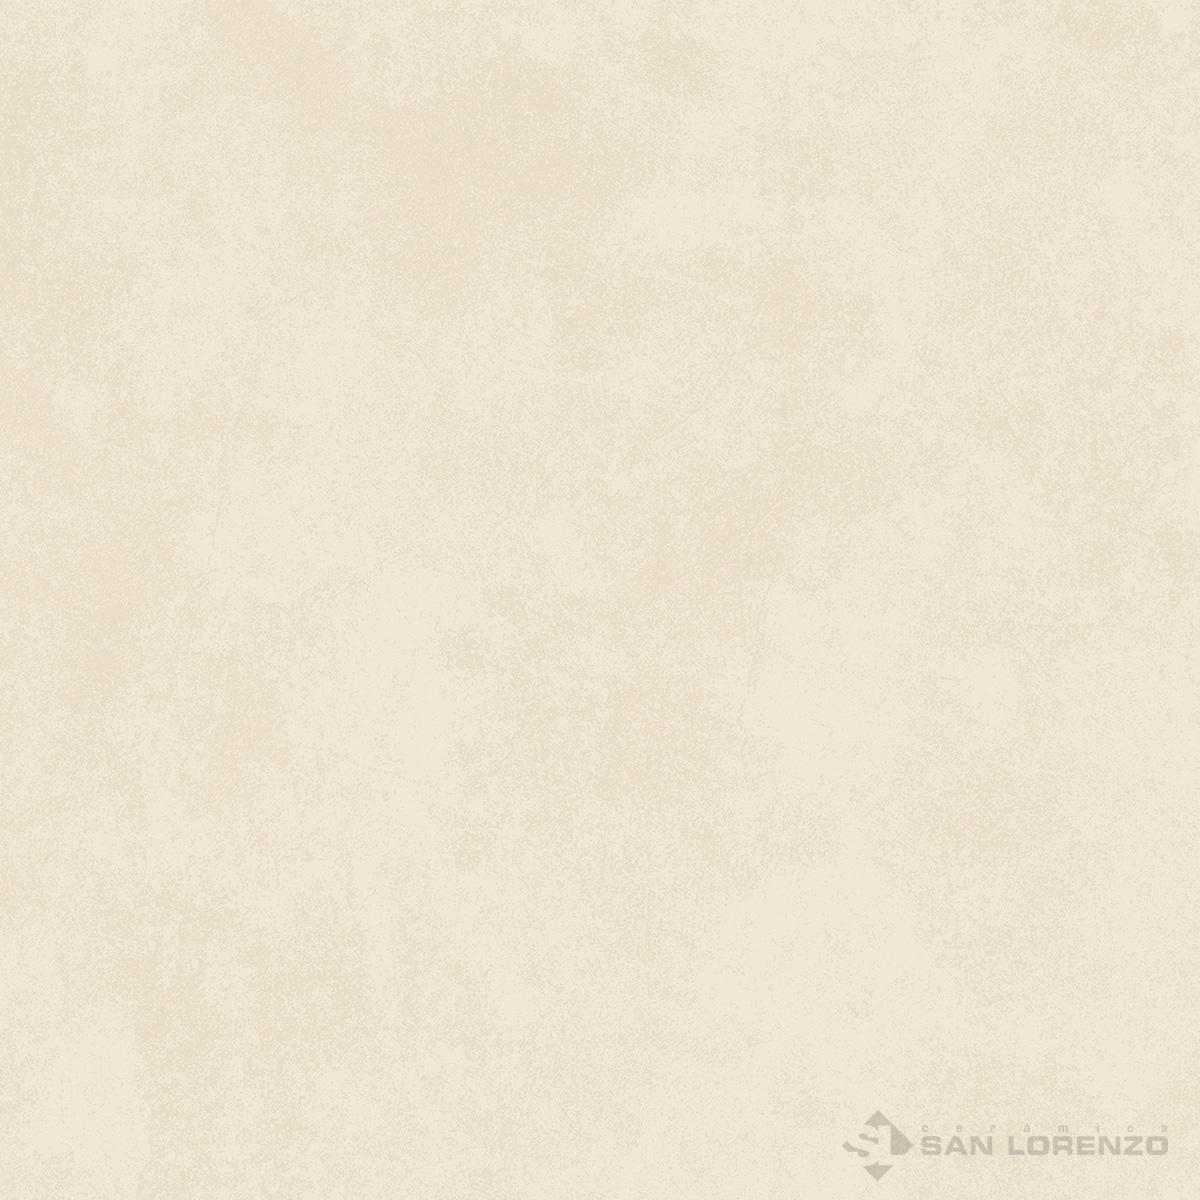 Porcelanato San Lorenzo Moods Hueso Rect. 2DA 59 x 59 Cj. 1,38 M2